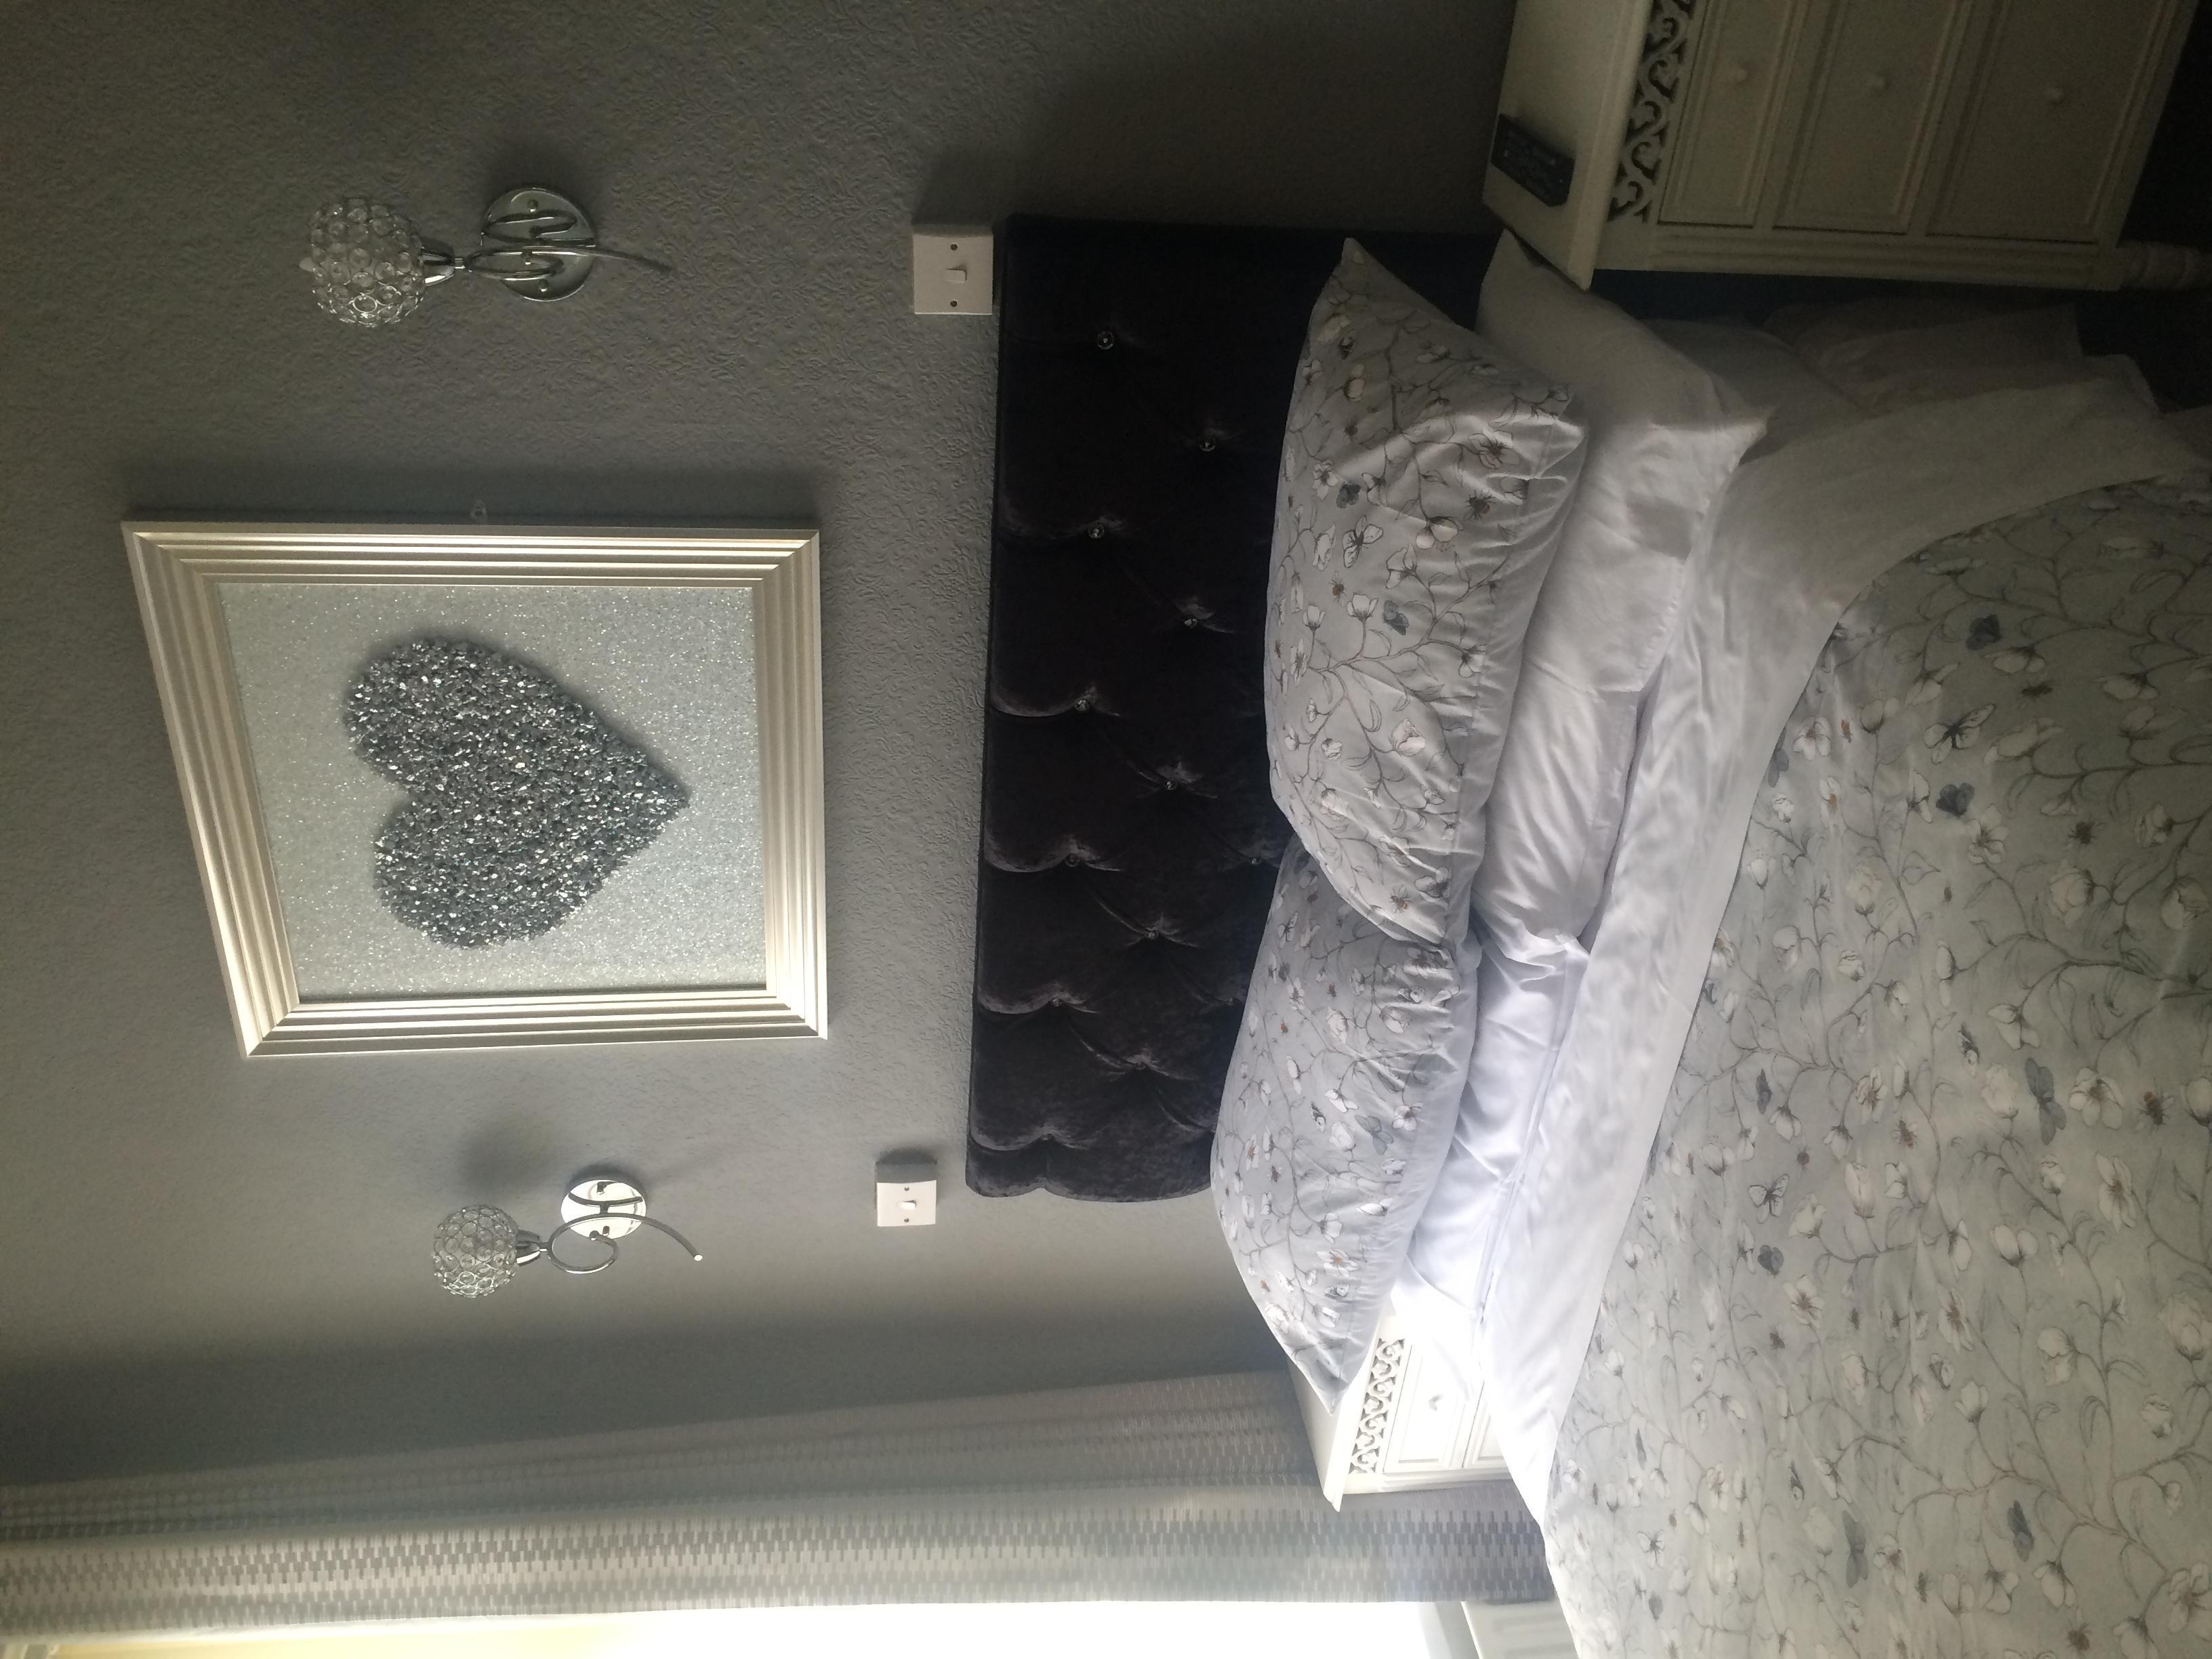 chesterfield house hotel blackpool lancashire fy1 4qq hotels uk com